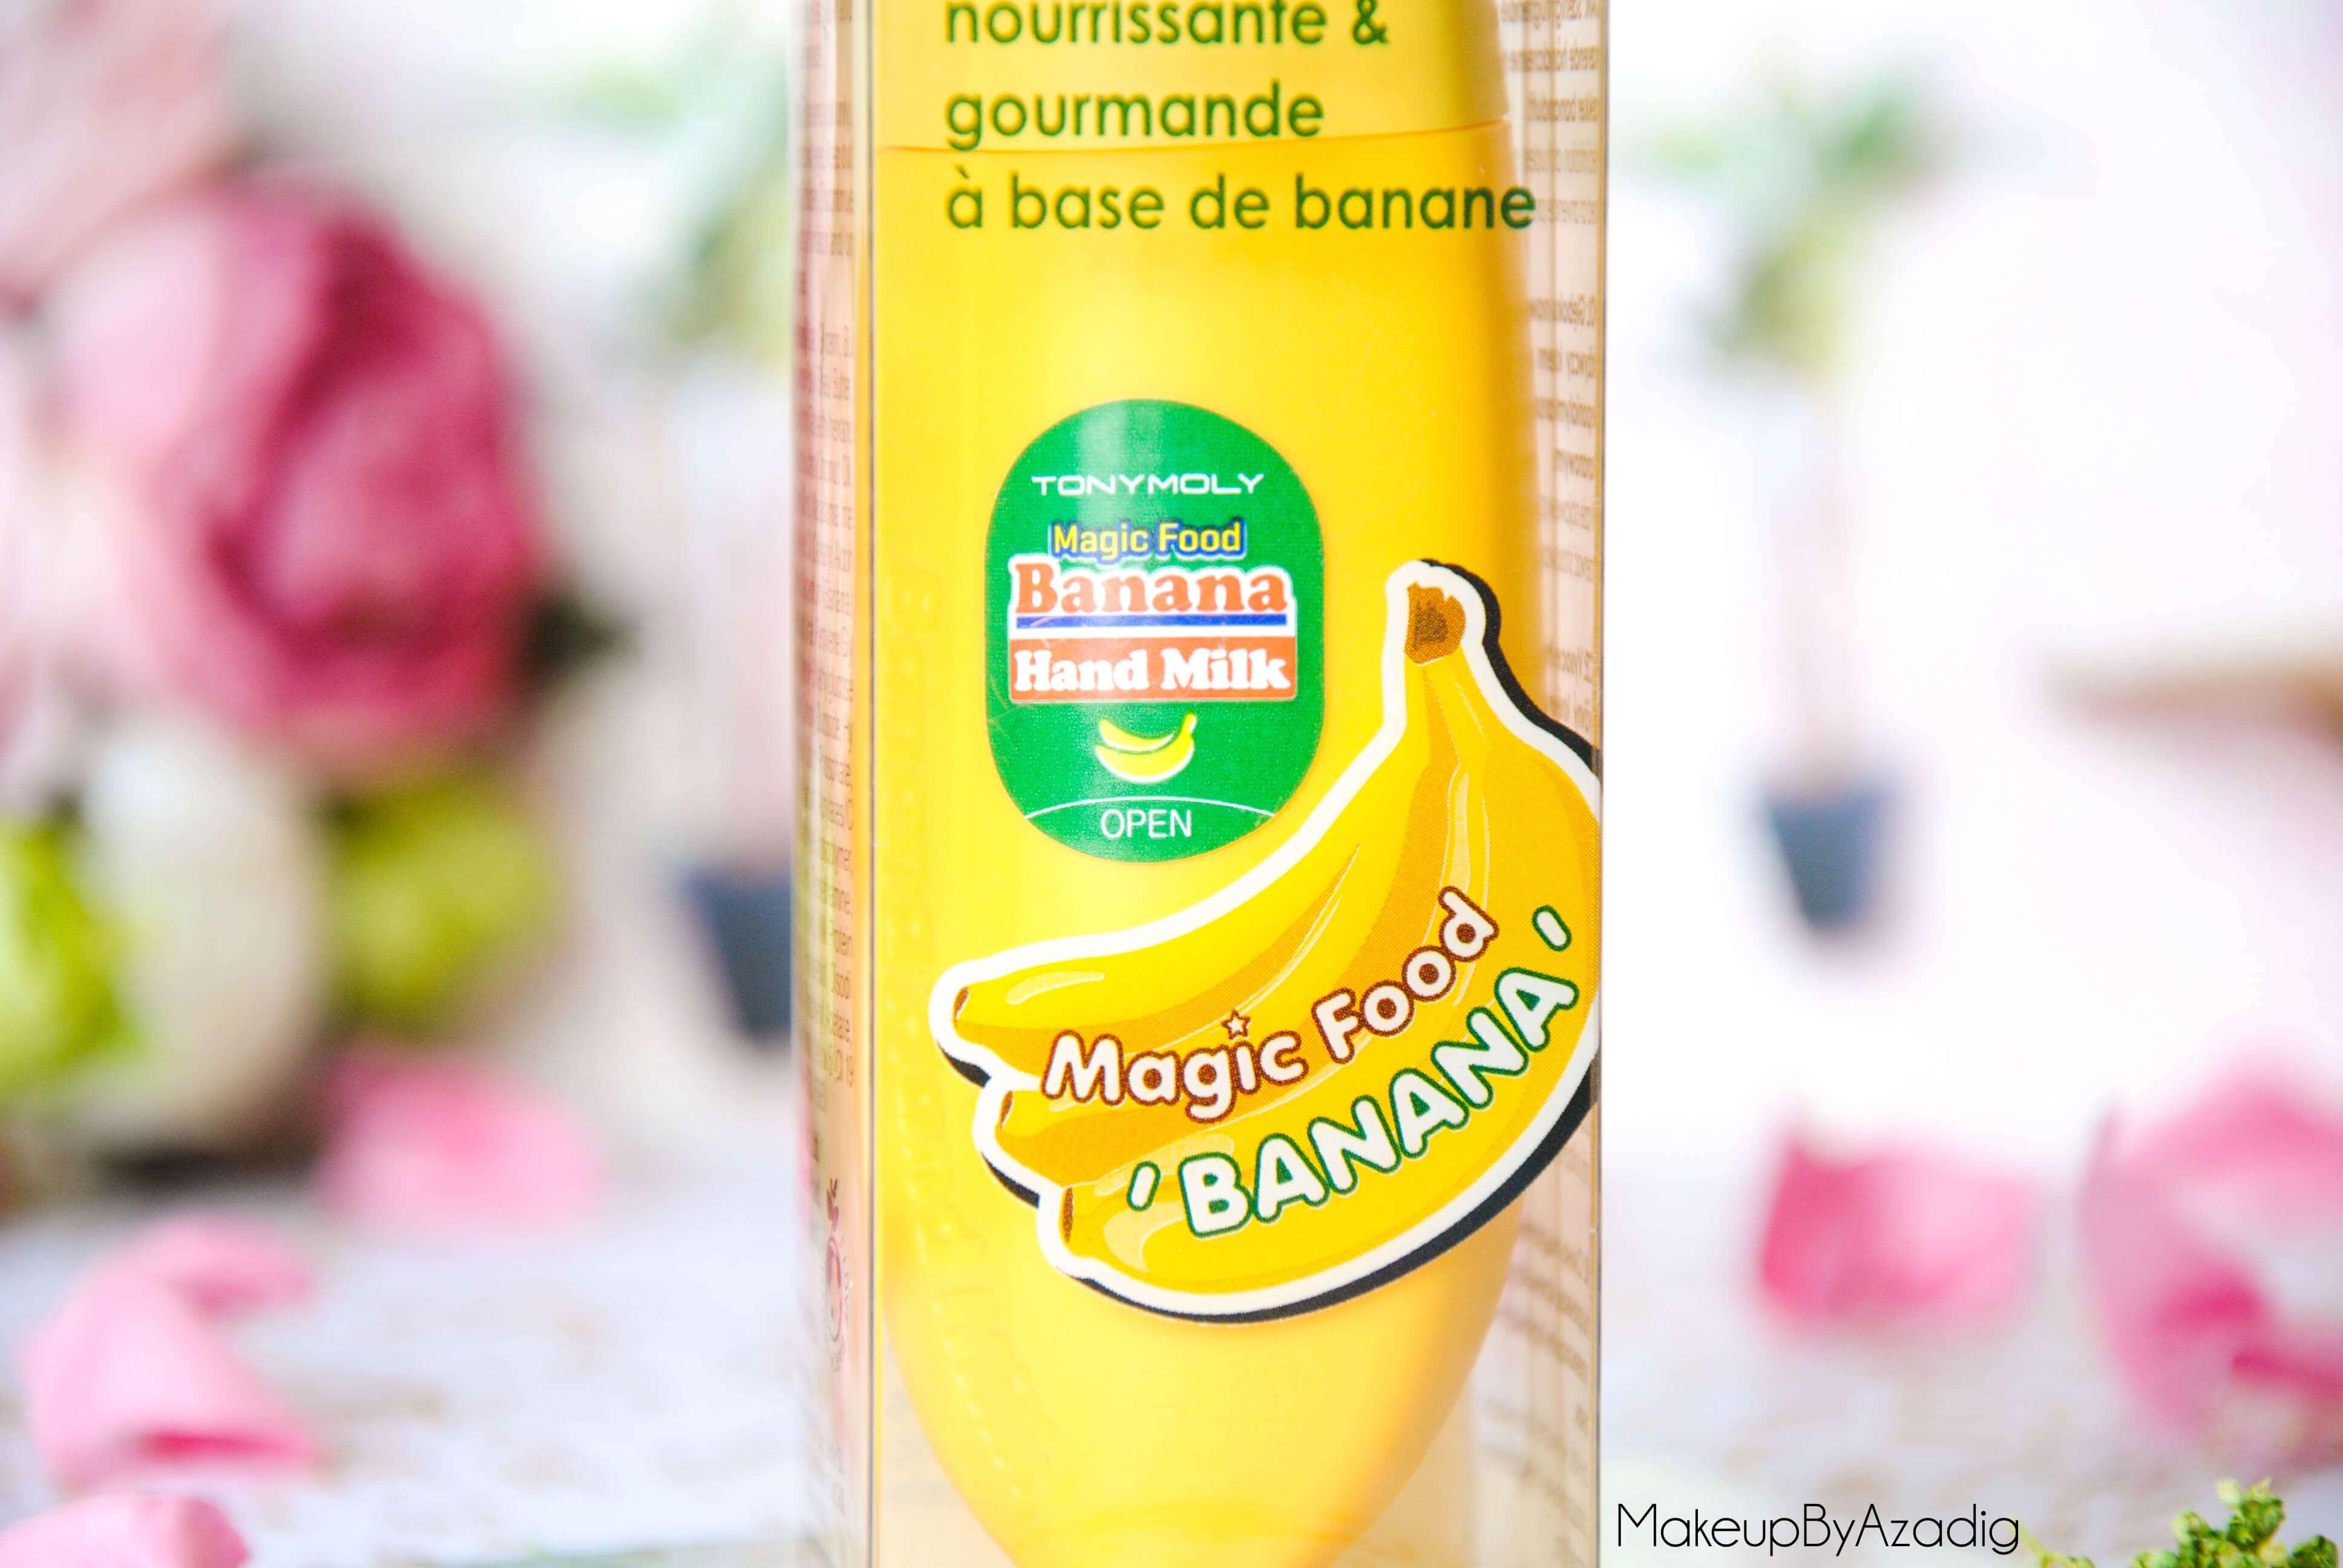 magic-food-banana-hand-milk-tonymoly-banane-creme-main-hand-cream-review-revue-paris-dijon-troyes-makeupbyazadig-kawai-gourmande